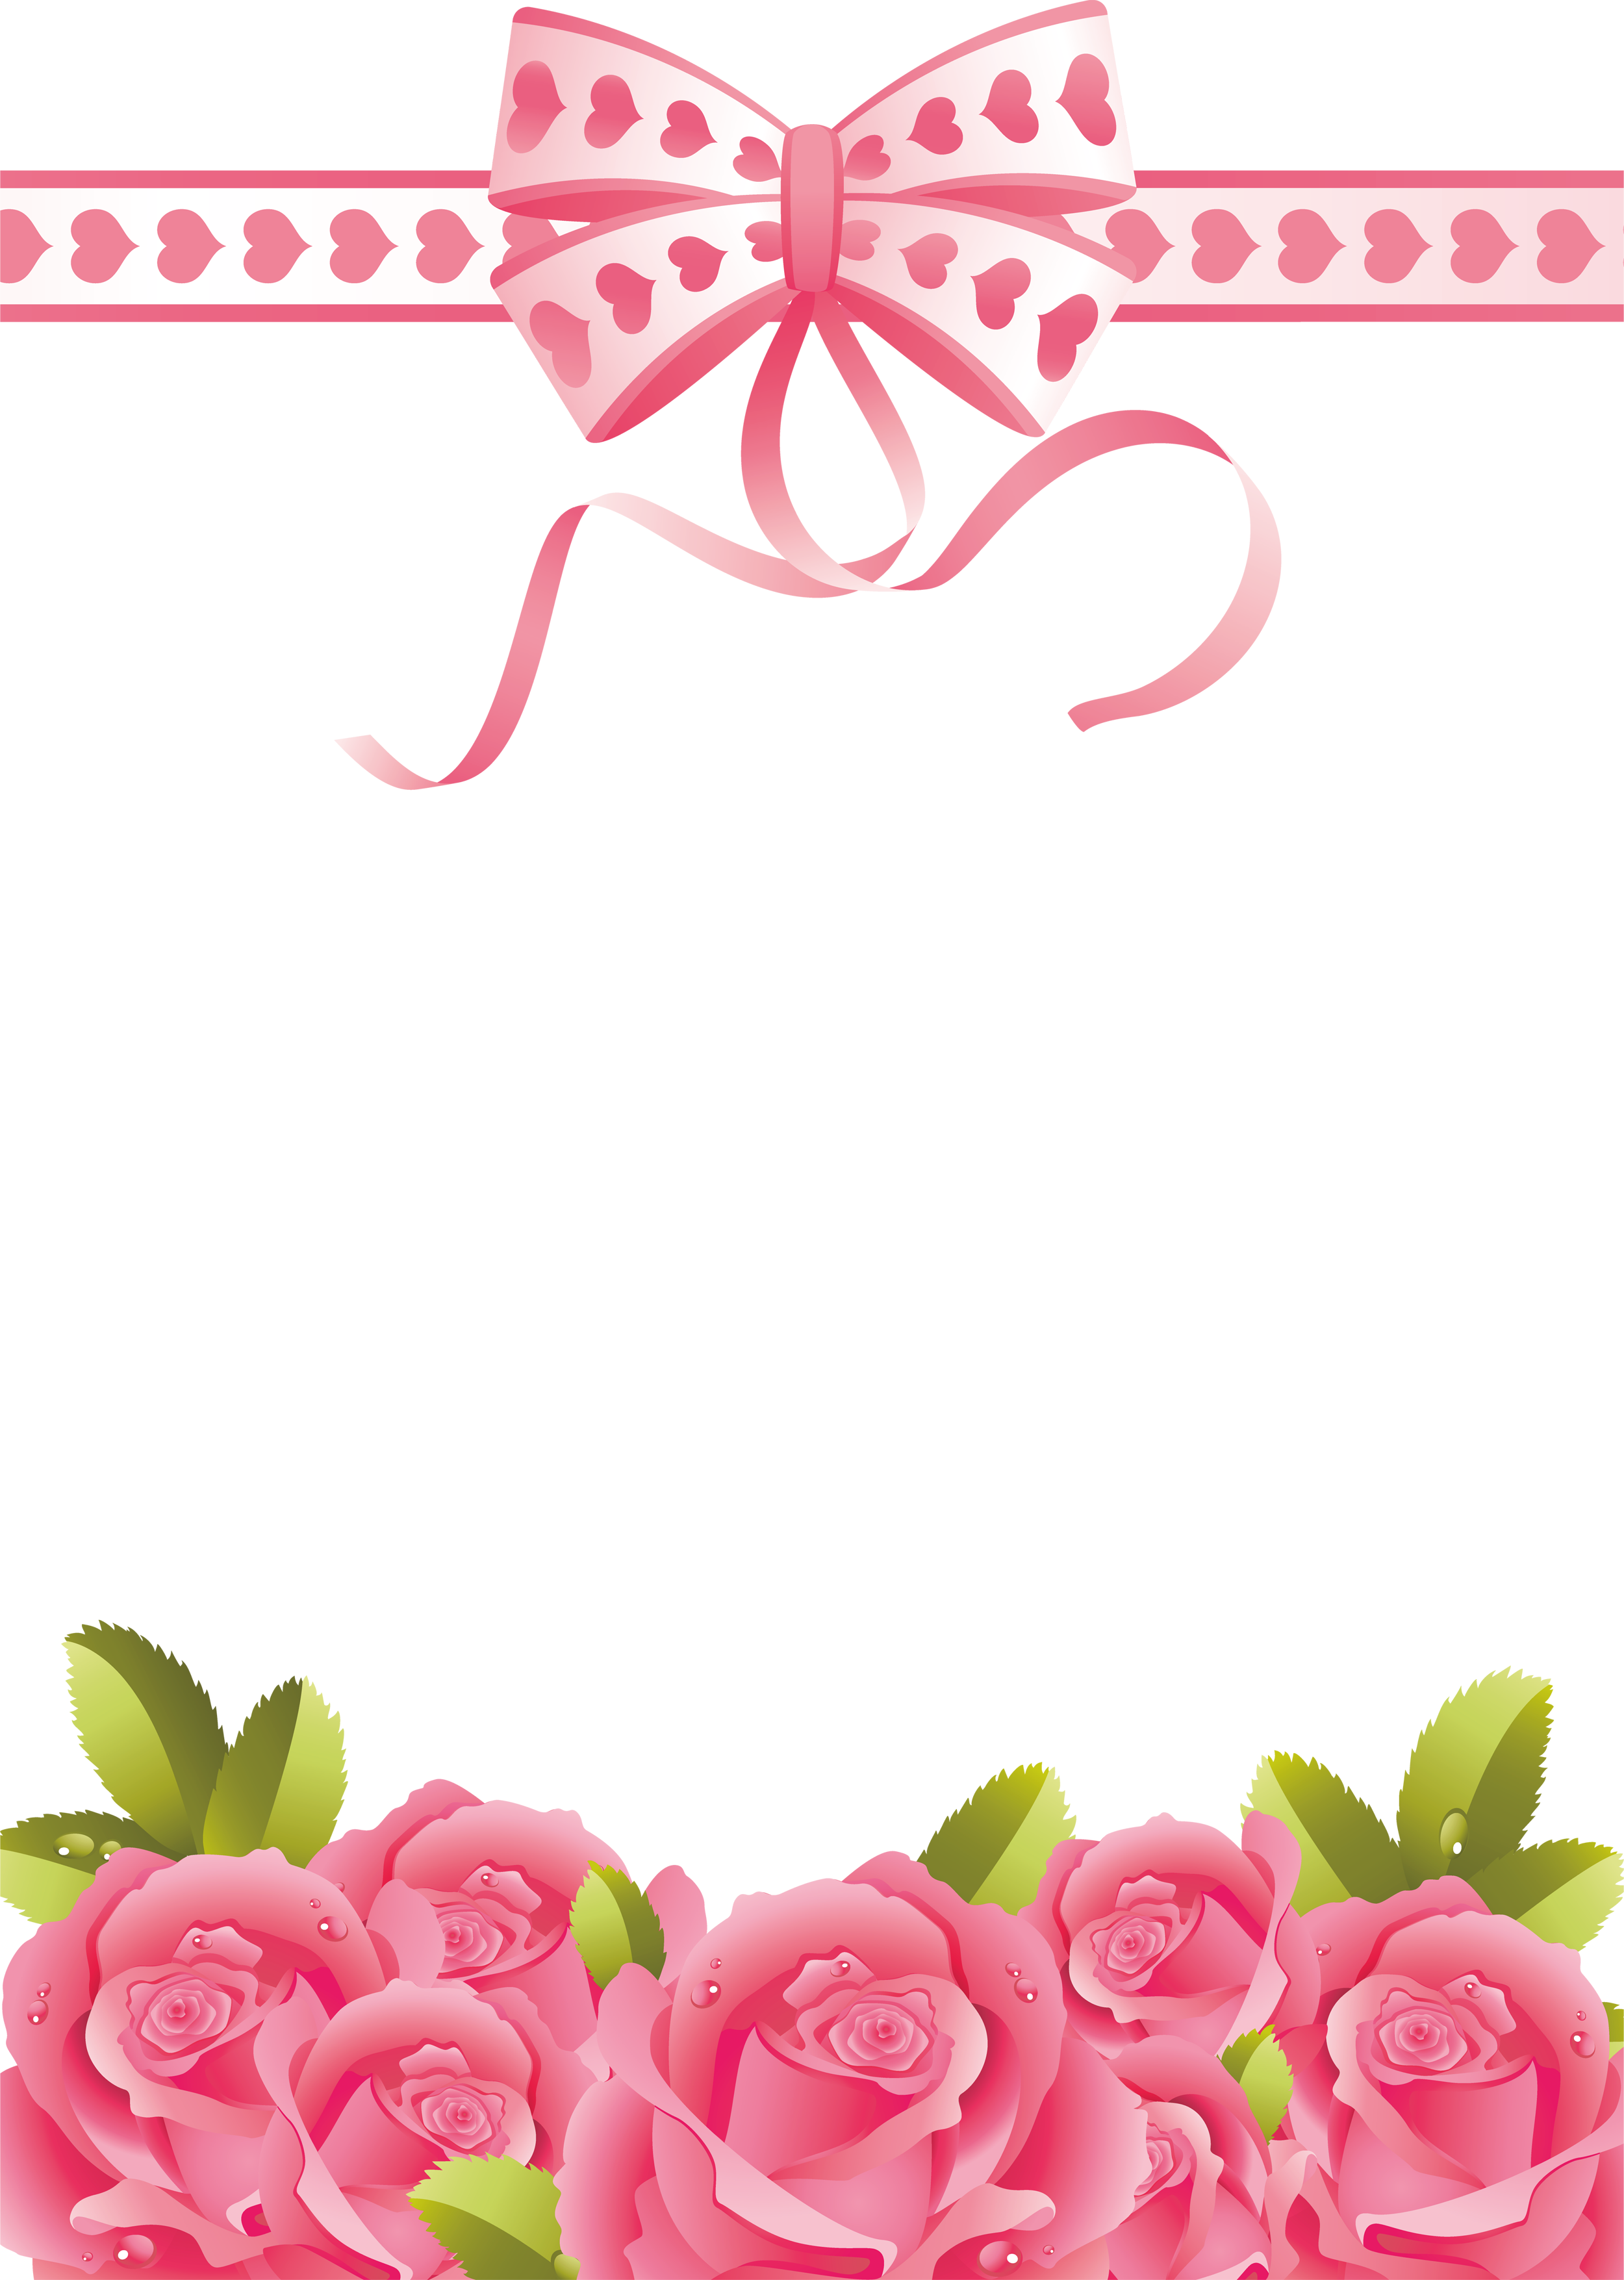 Clipart frames pink rose. Roses transparent png photo